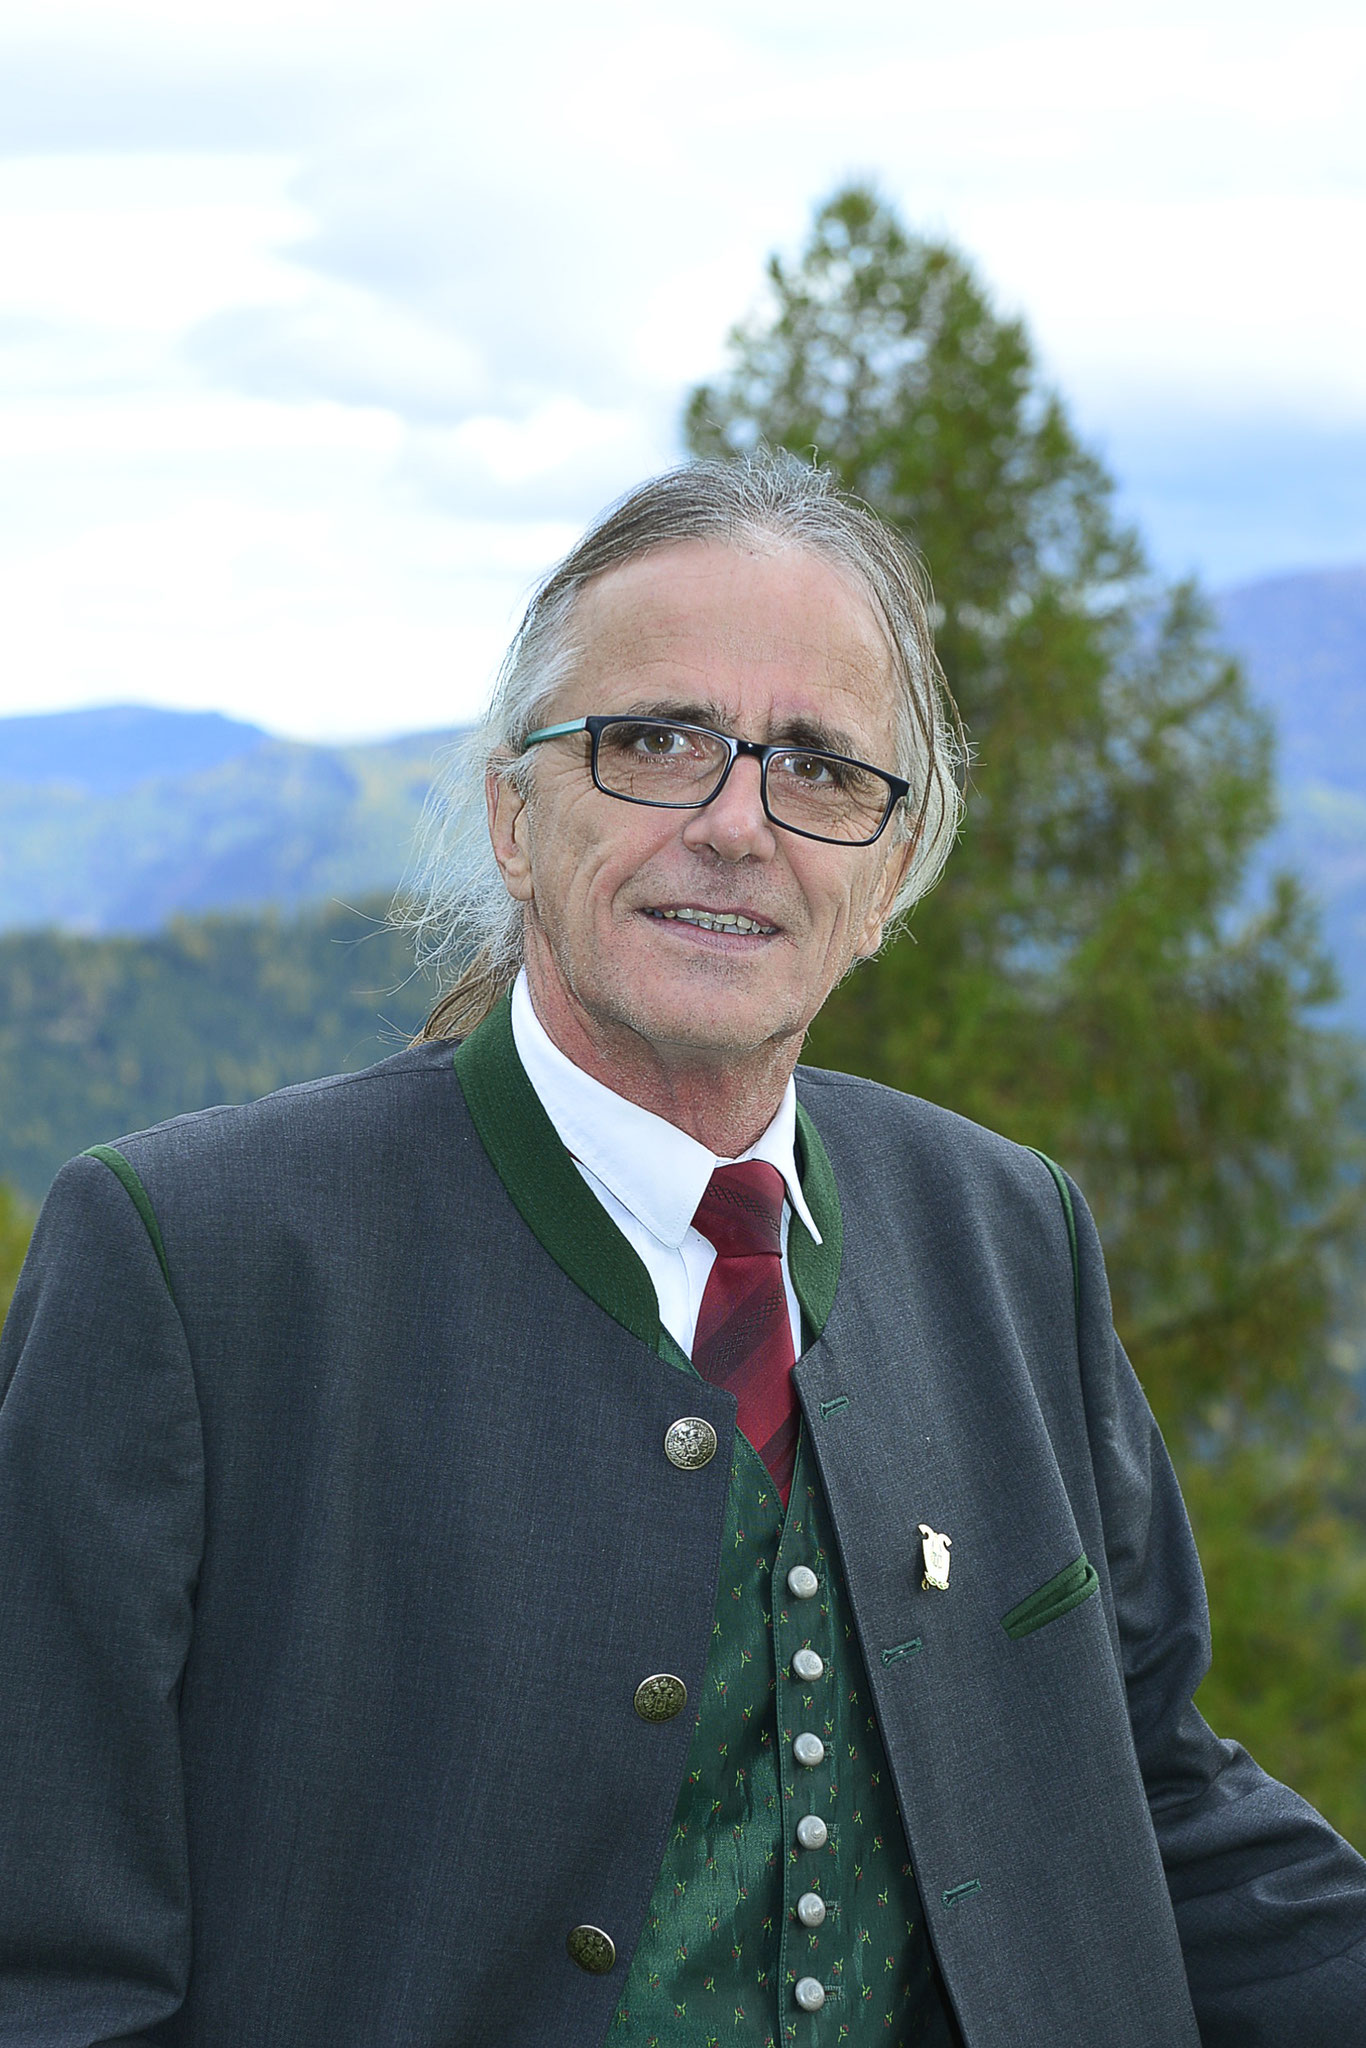 Peter Spreitzer